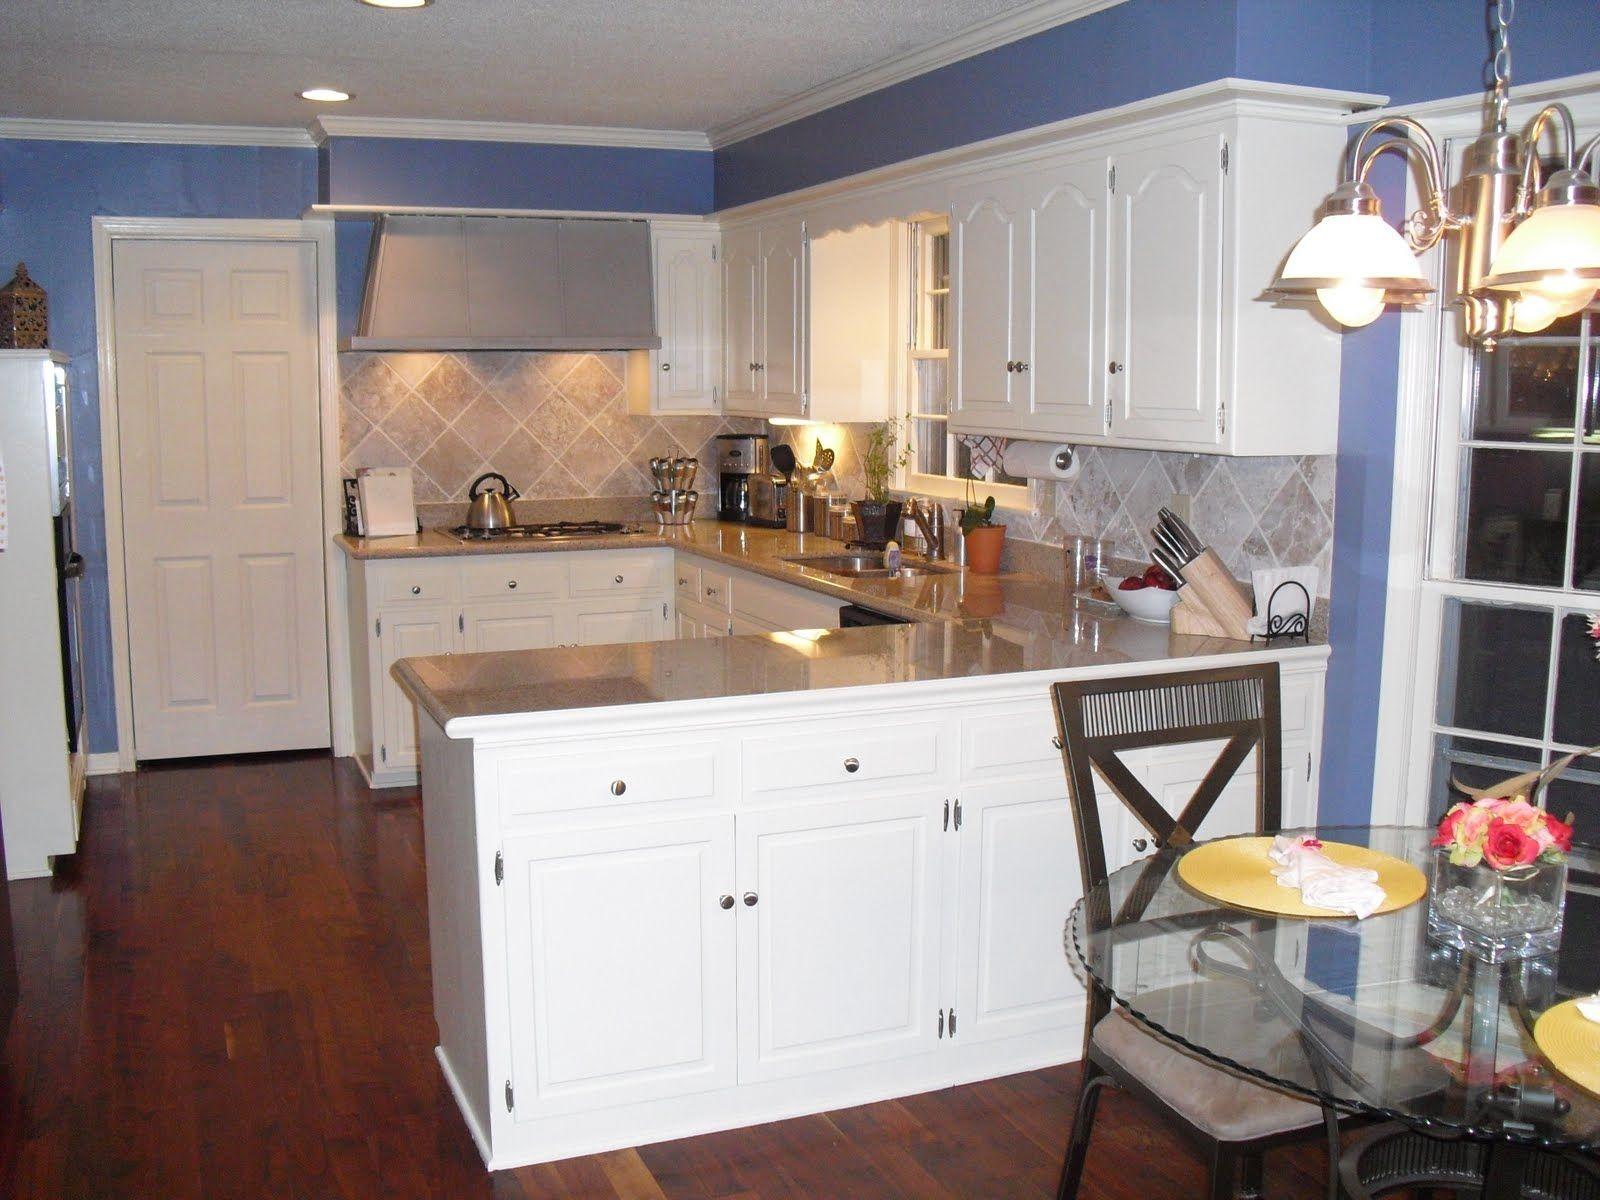 Blue Kitchen Cabinets Home Decor Pinterest